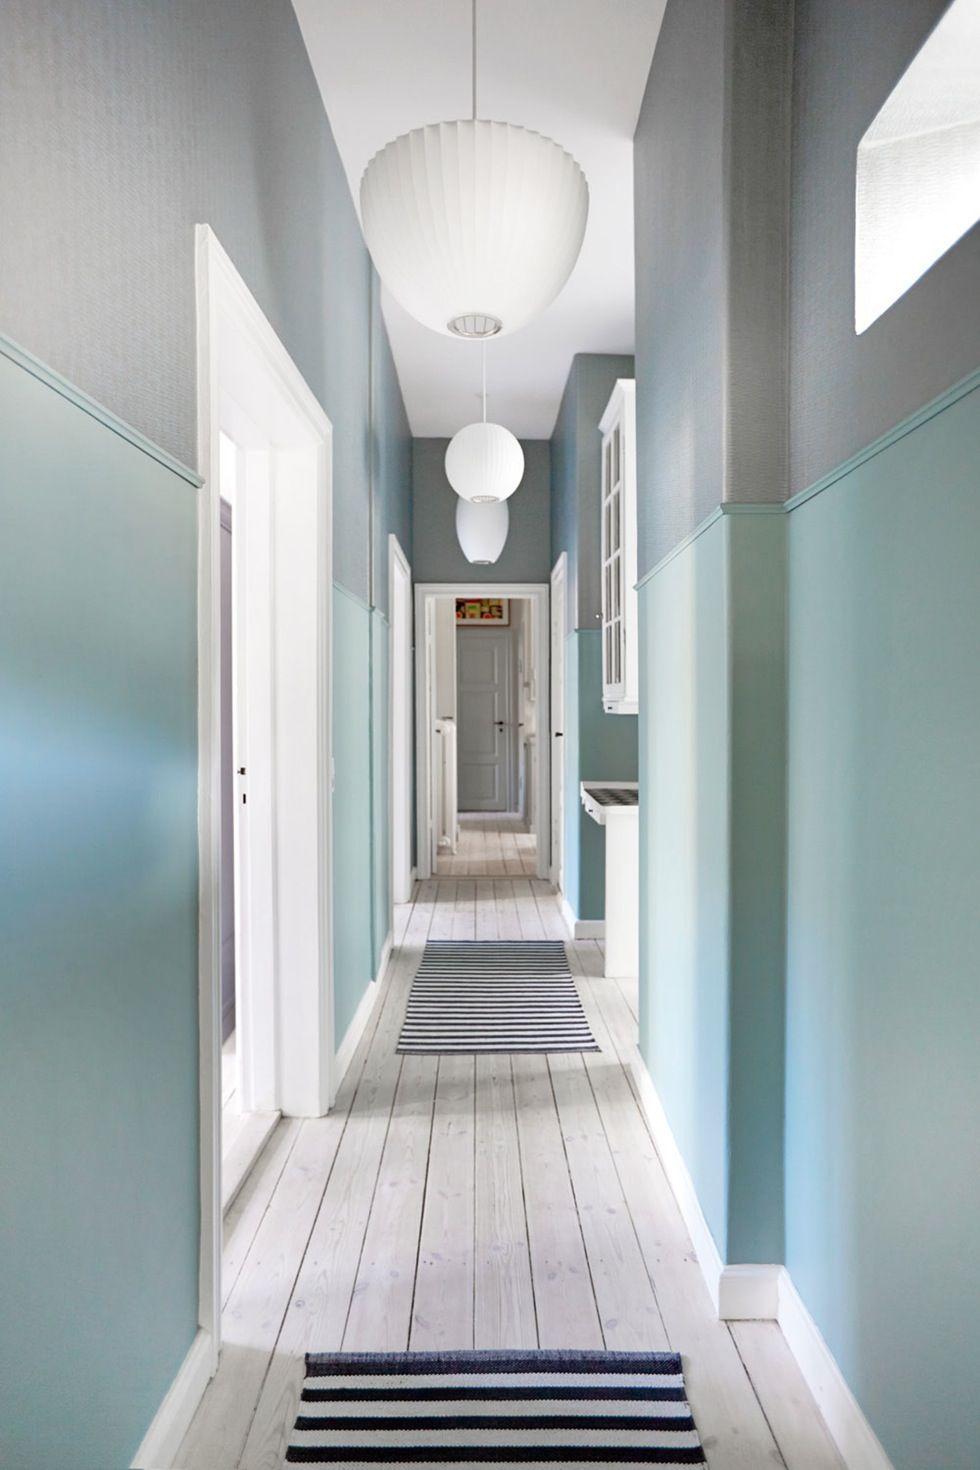 join home to mette heiberg bo moodboard 2 pinterest wandfarben flur deko und flure. Black Bedroom Furniture Sets. Home Design Ideas